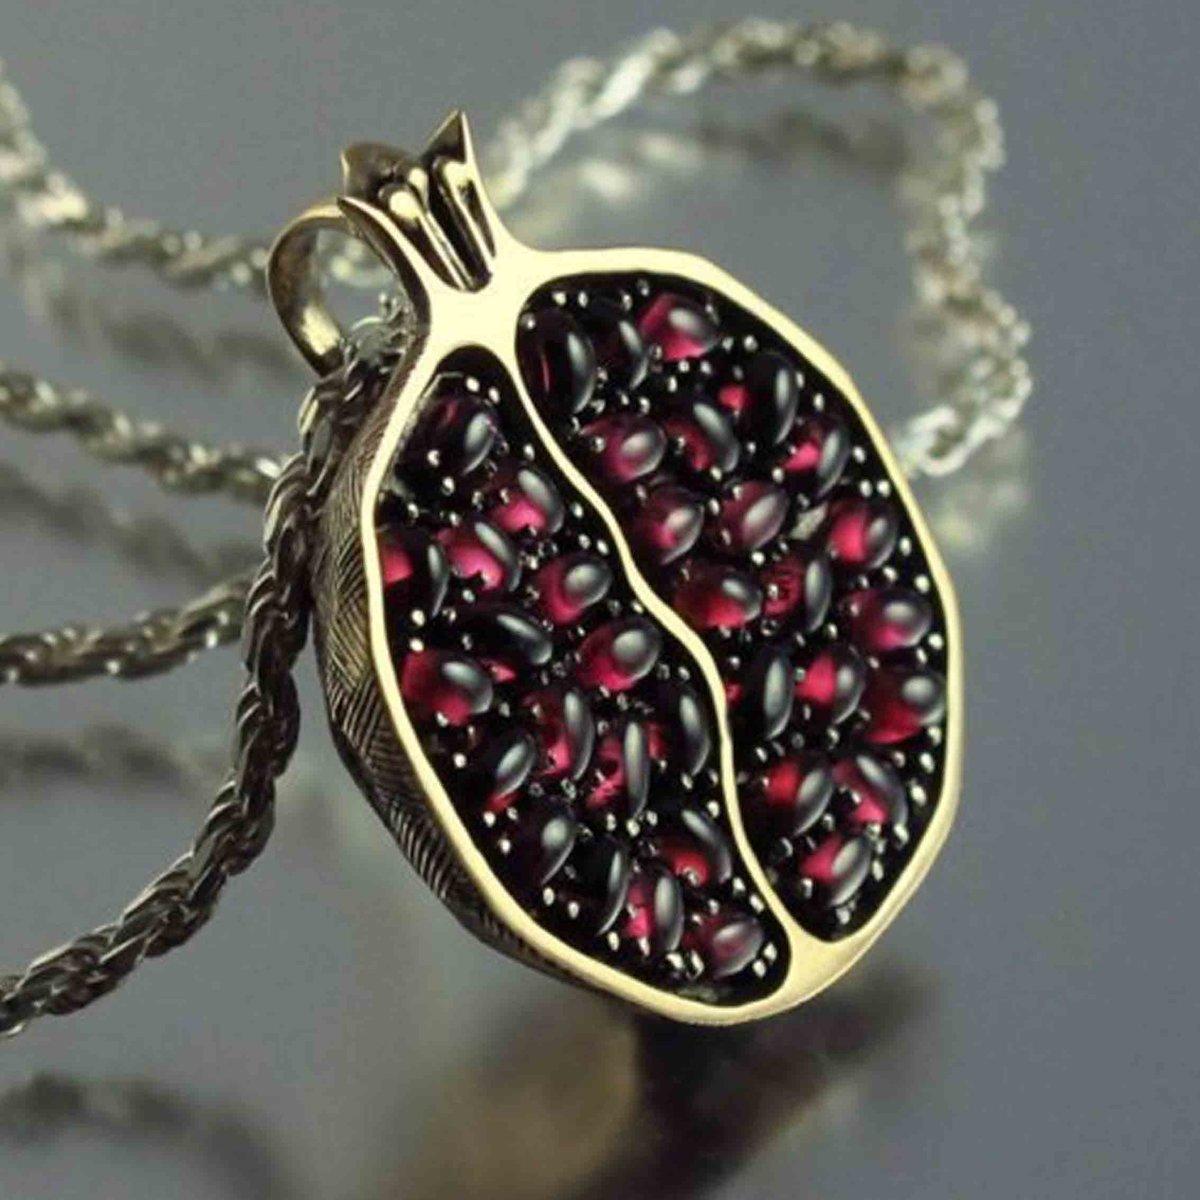 камень гранат - символ любви